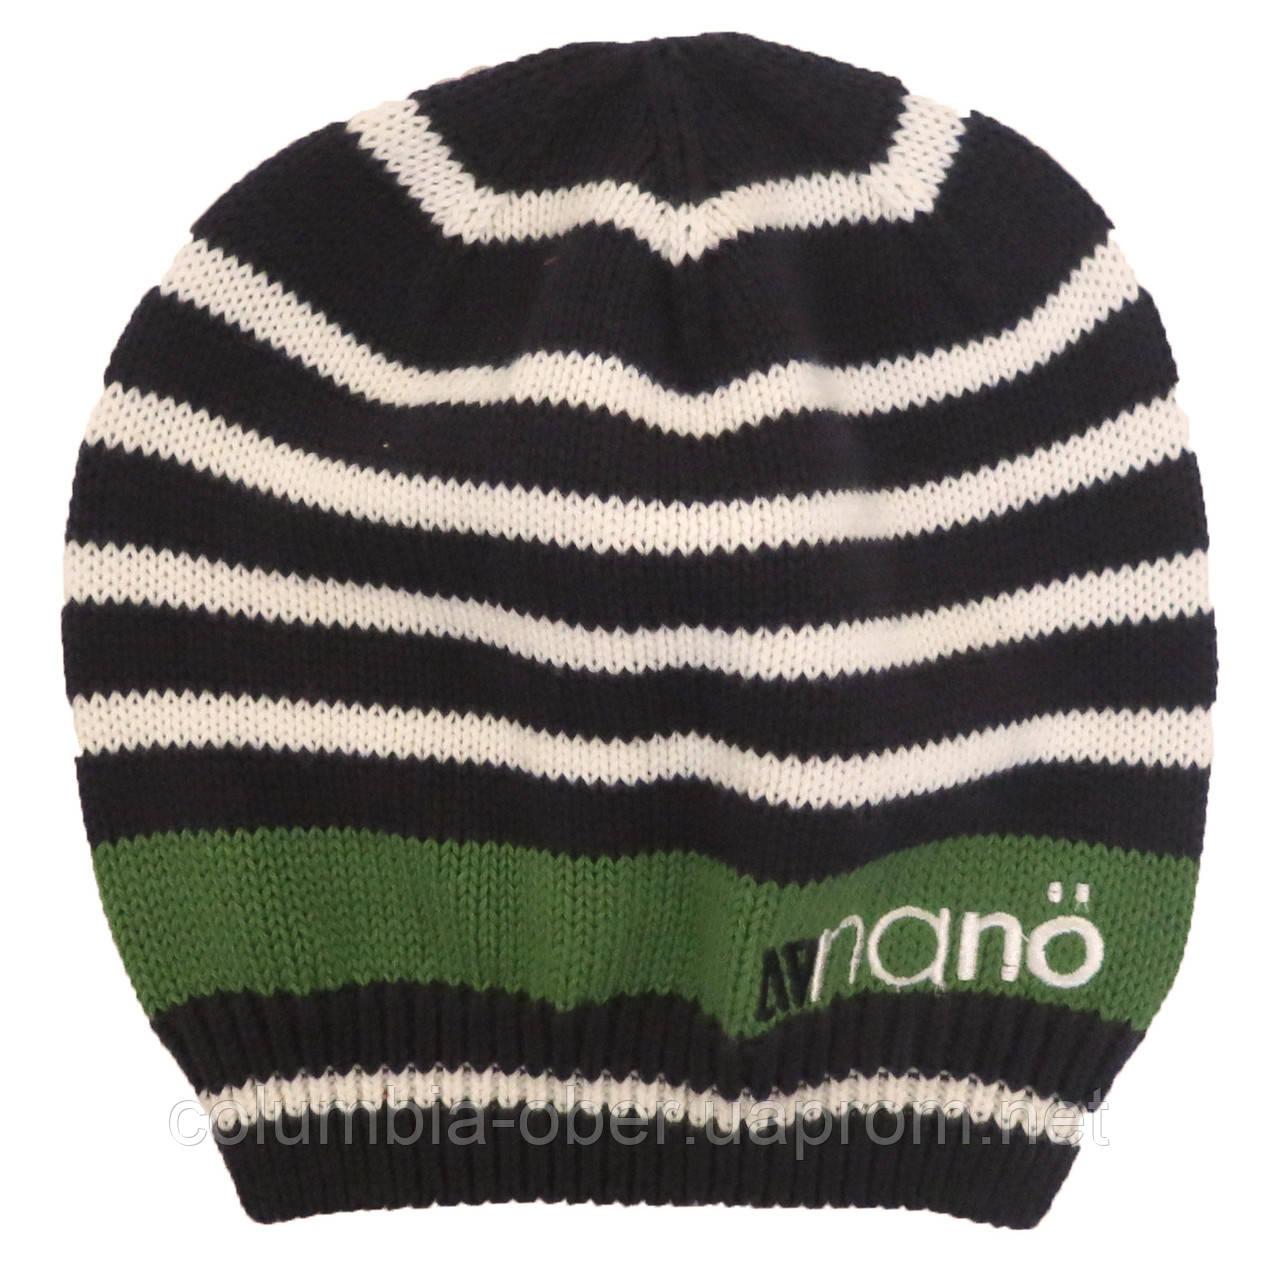 Демисезонная шапка для мальчика NANO 259 TUT S18 Dk Heaven. Размер 12/24-7/12.